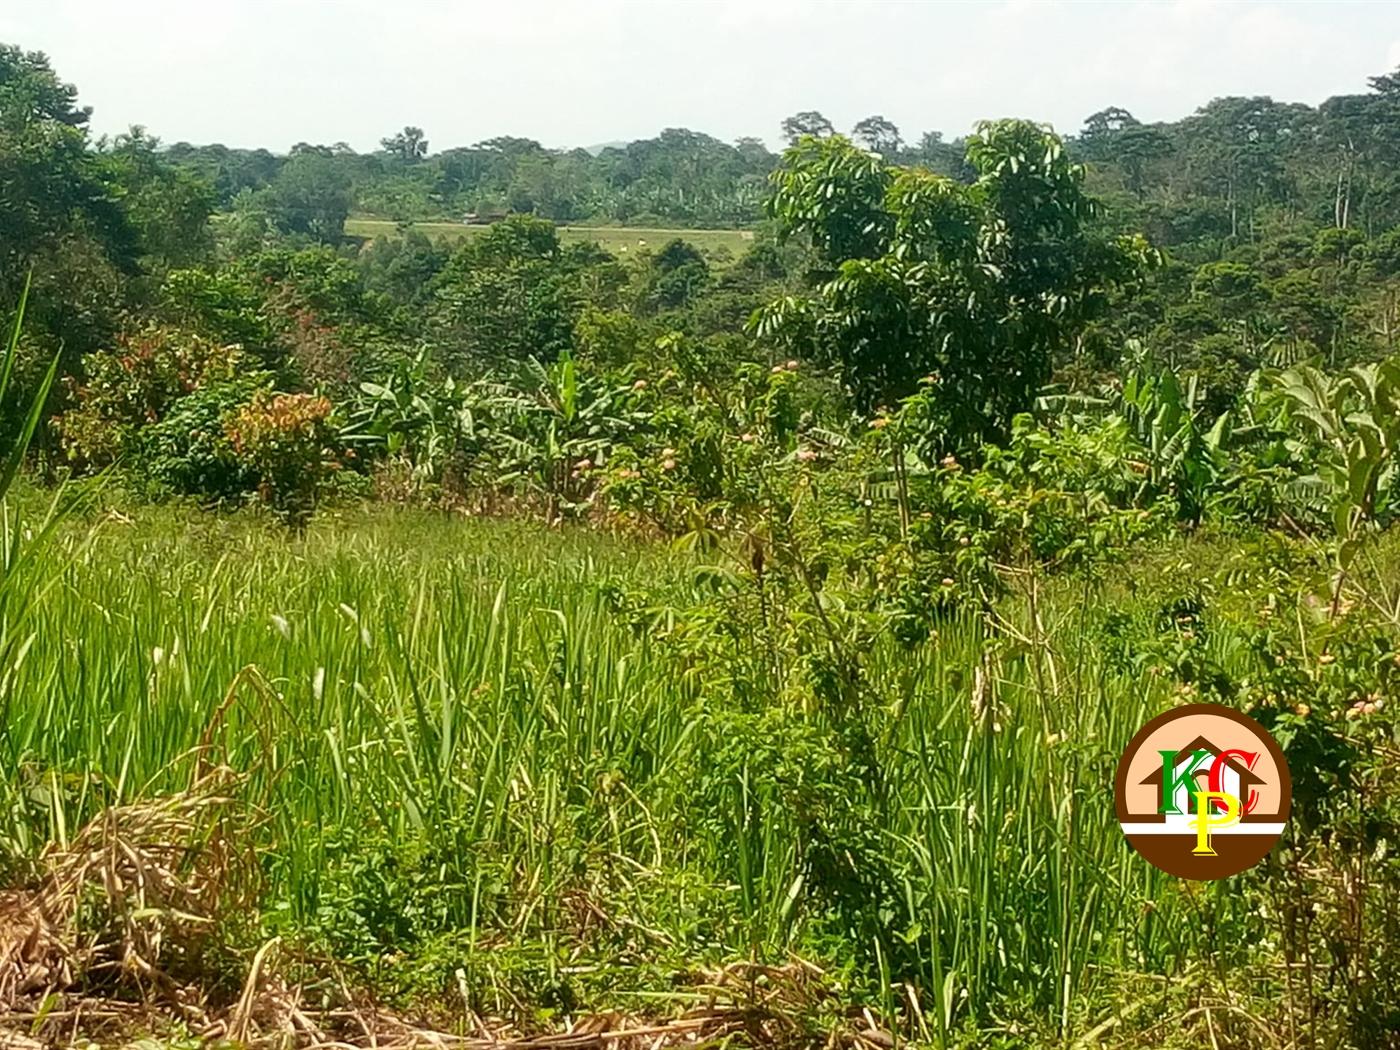 Residential Land for sale in Nkokonjeru Mukono